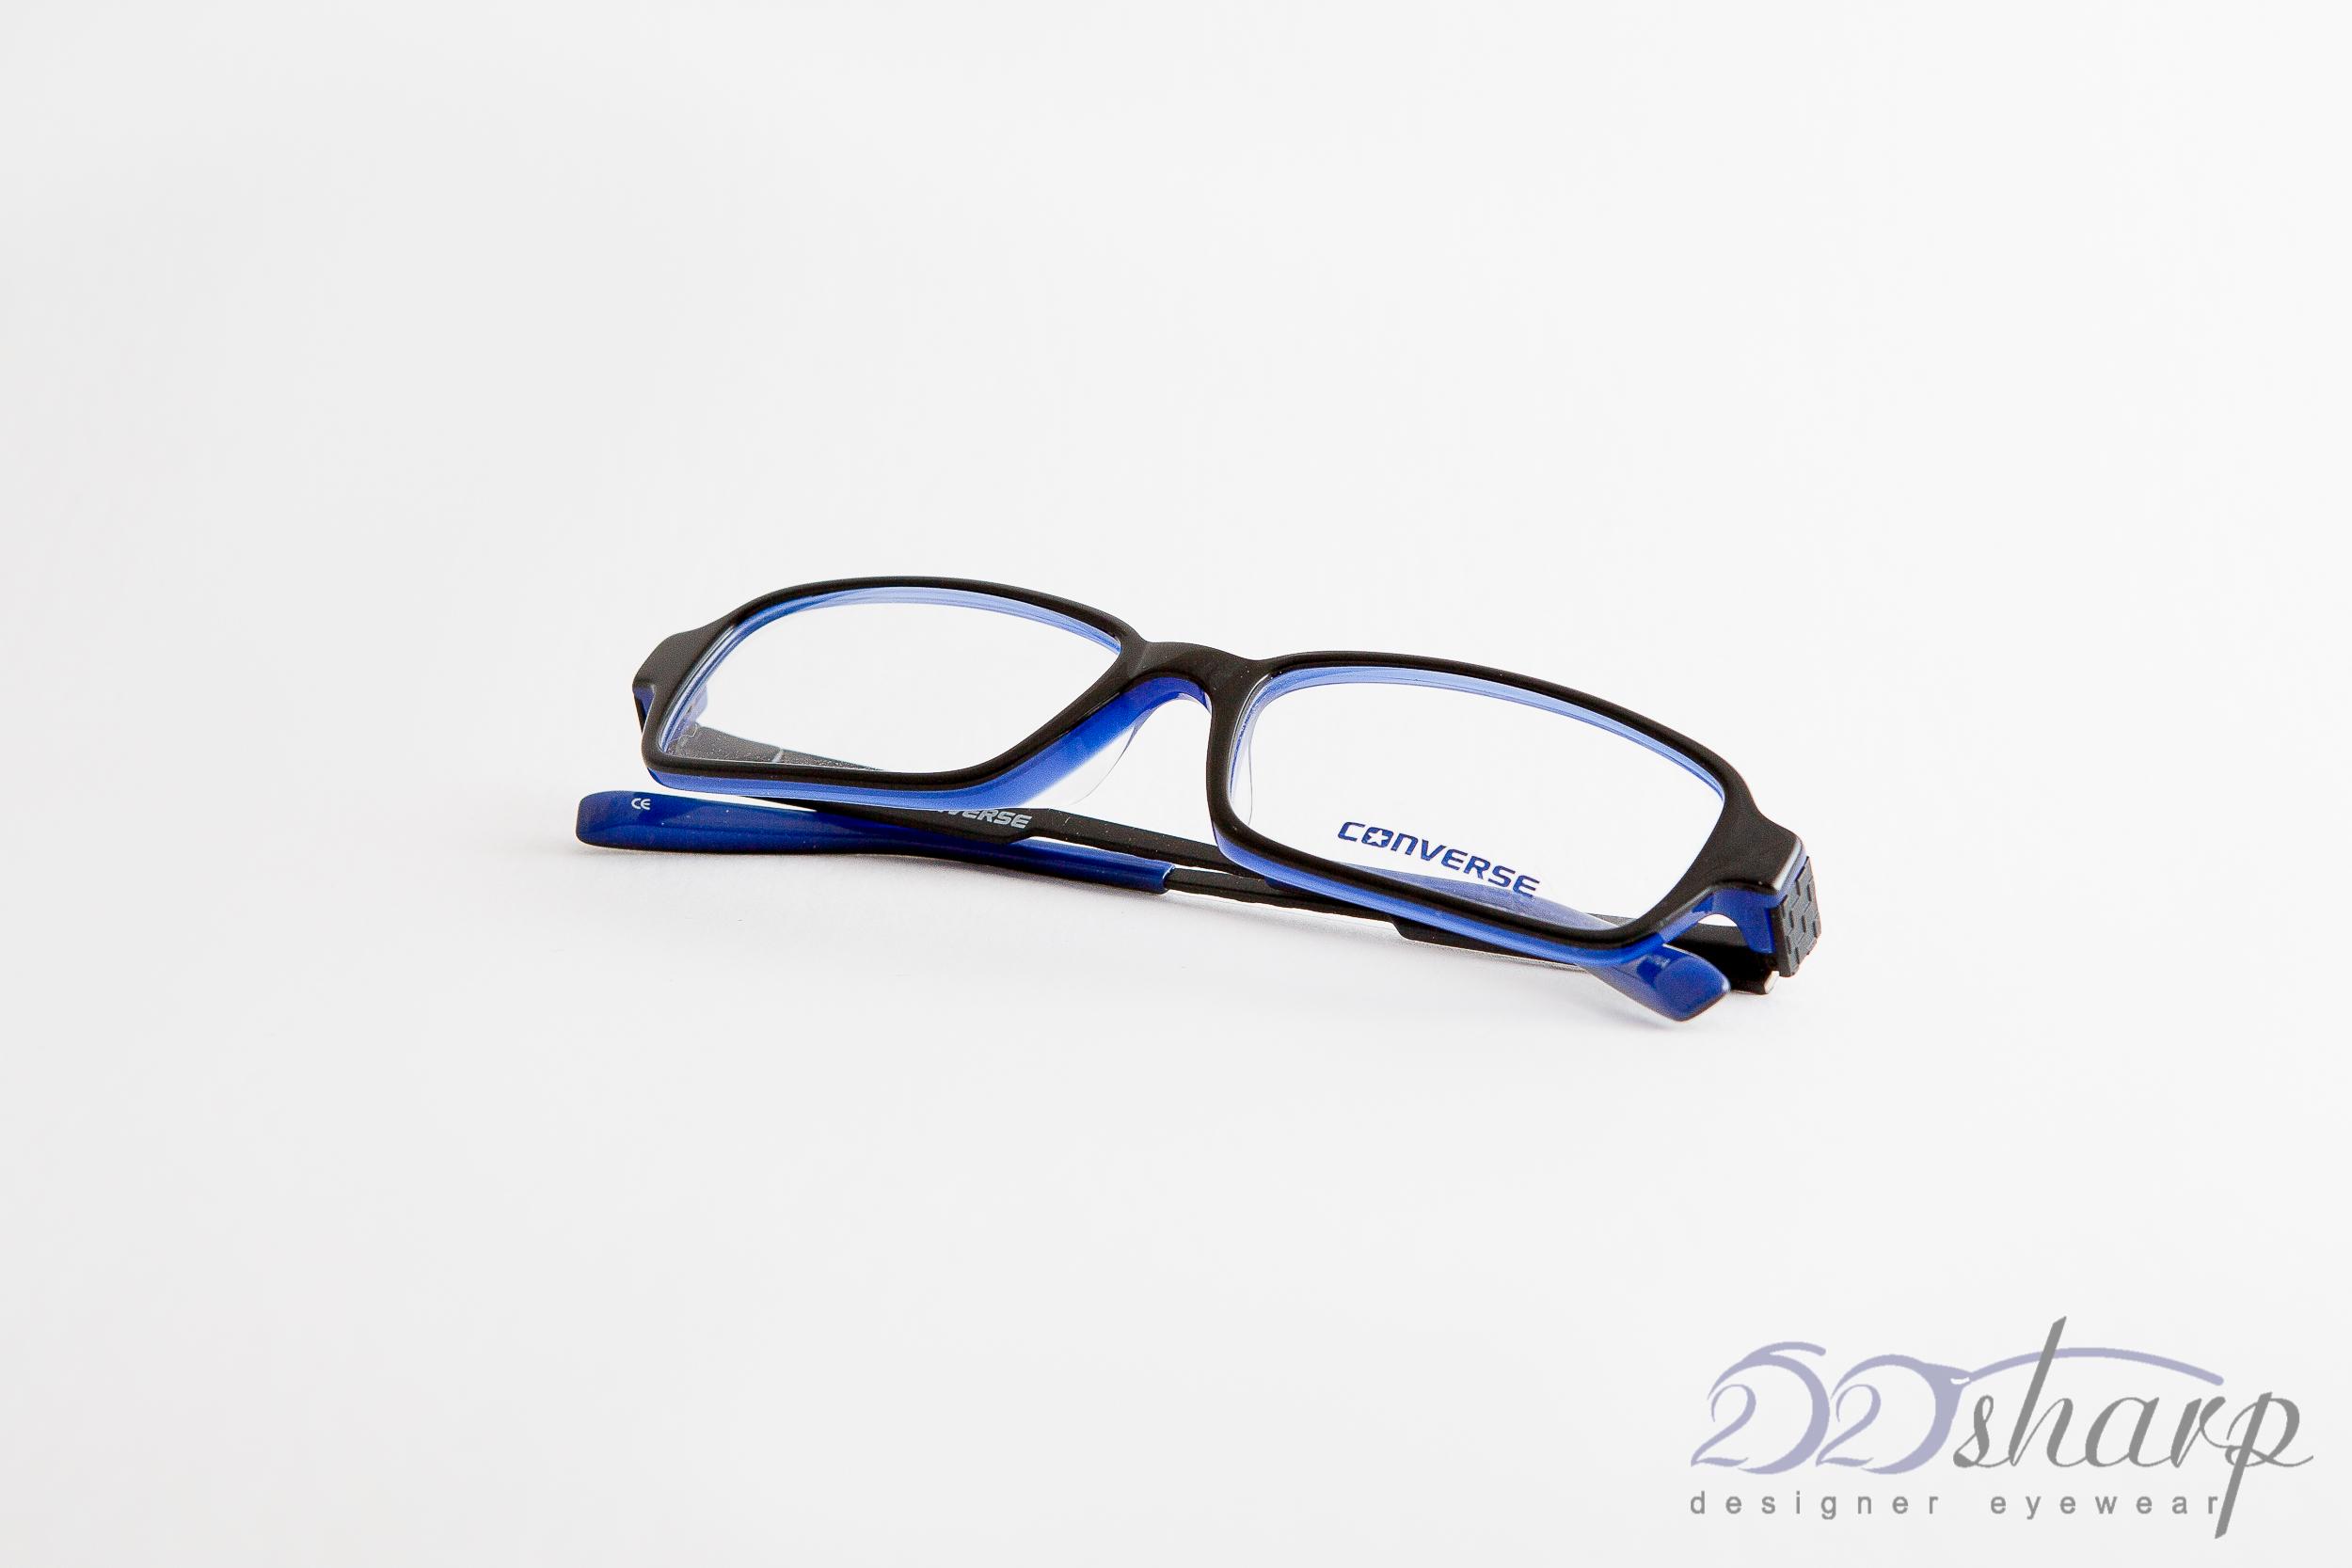 converse eyeglasses q002uf black black blue ebay